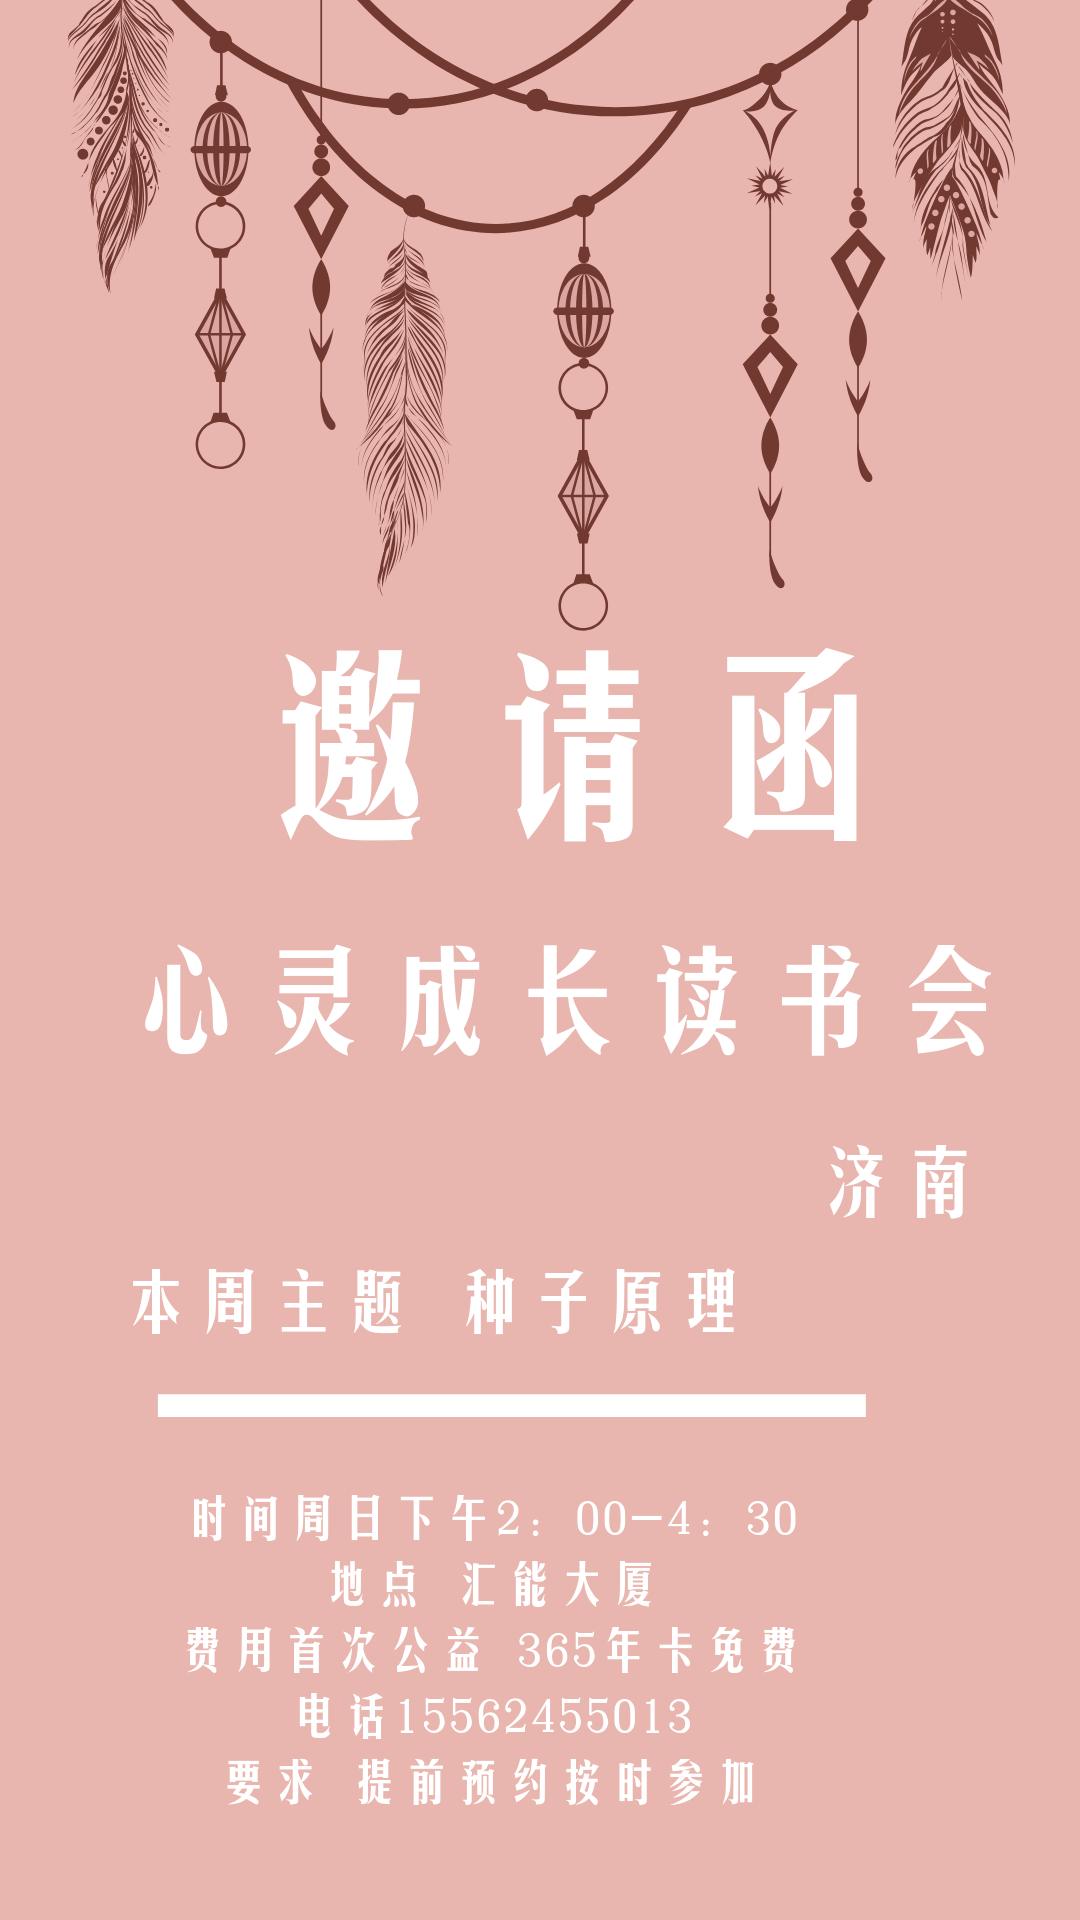 http://www.huodongxing.com/file/20190520/5863426884510/443547685132878.png